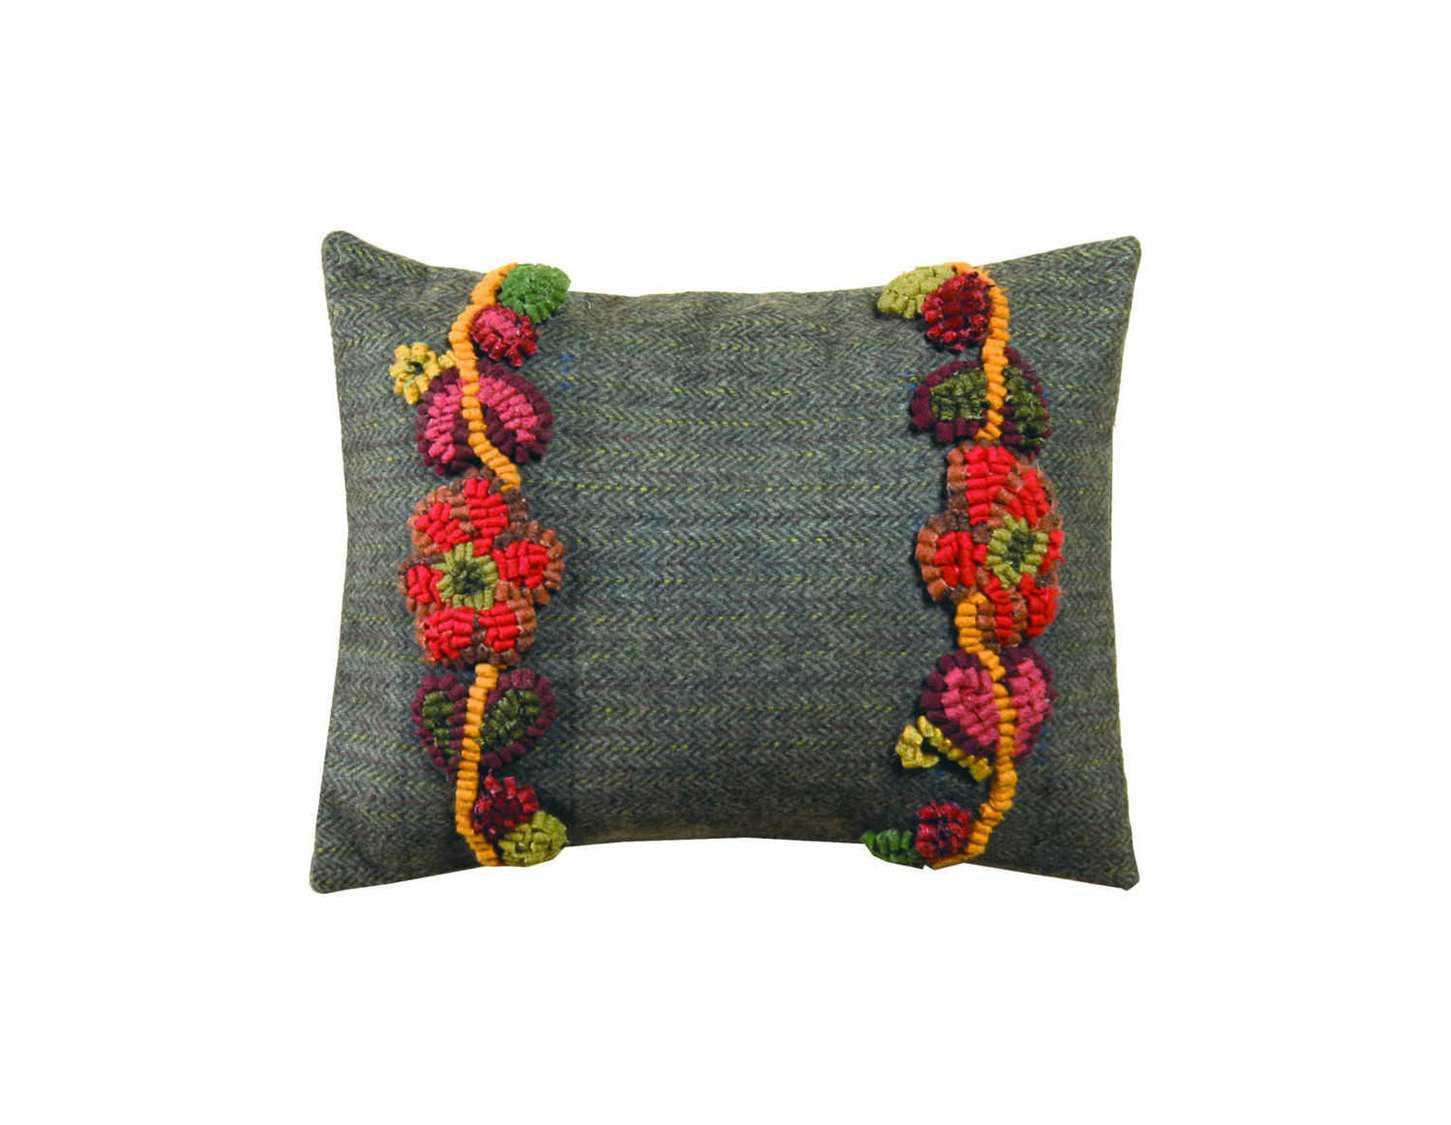 Homespice Decor Floral Vines Pillow Hofloralvinespillow